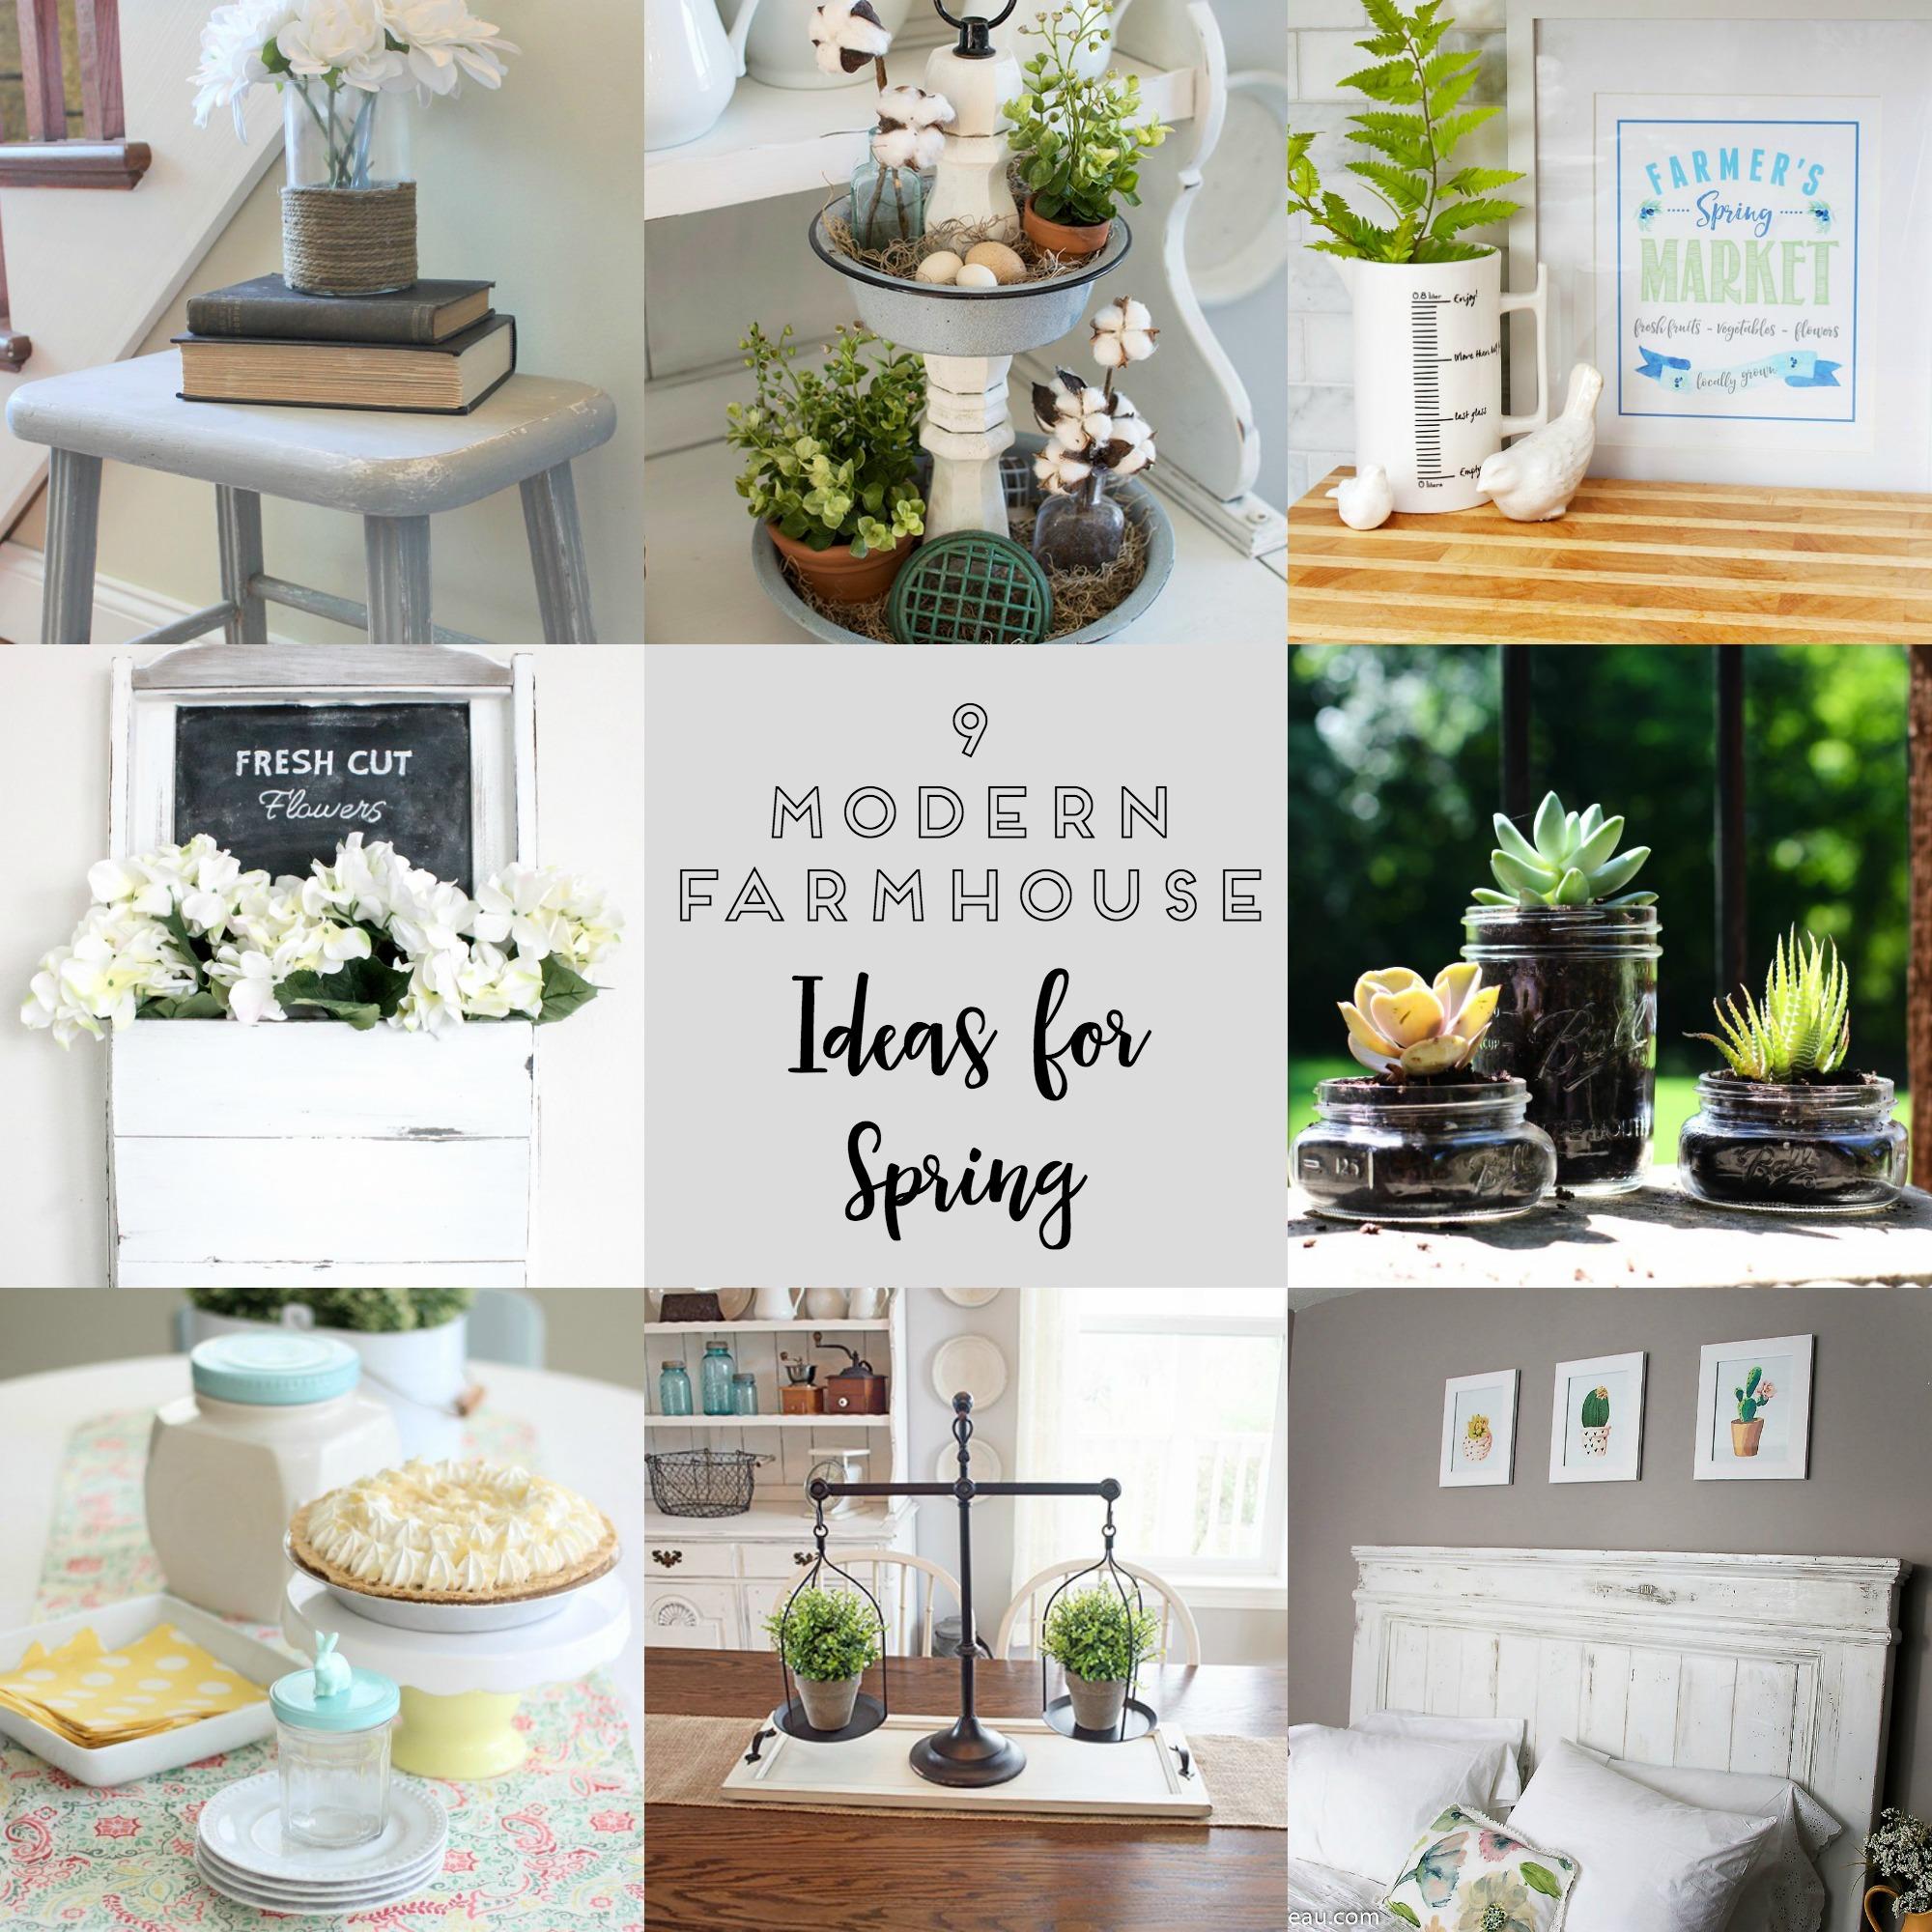 Modern Farmhouse Ideas for Spring